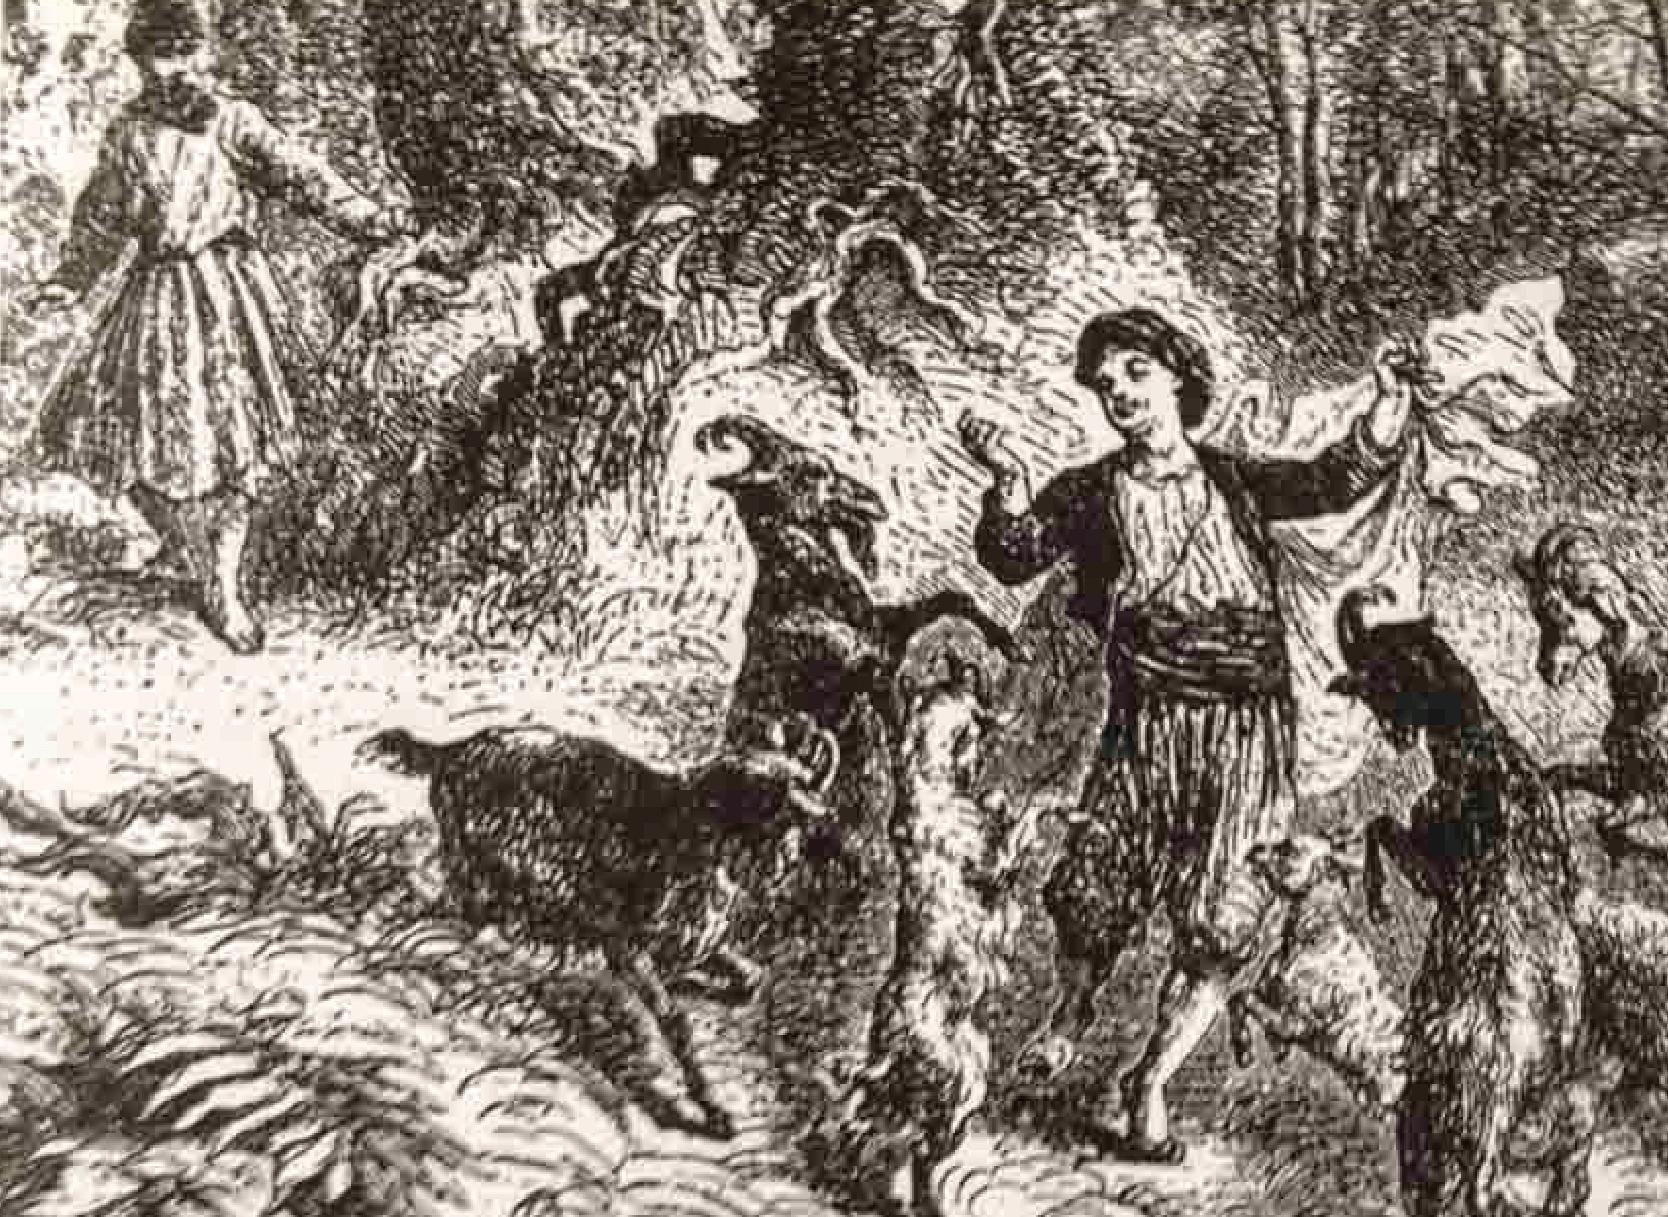 Illustration of Kaldi the goat herder.